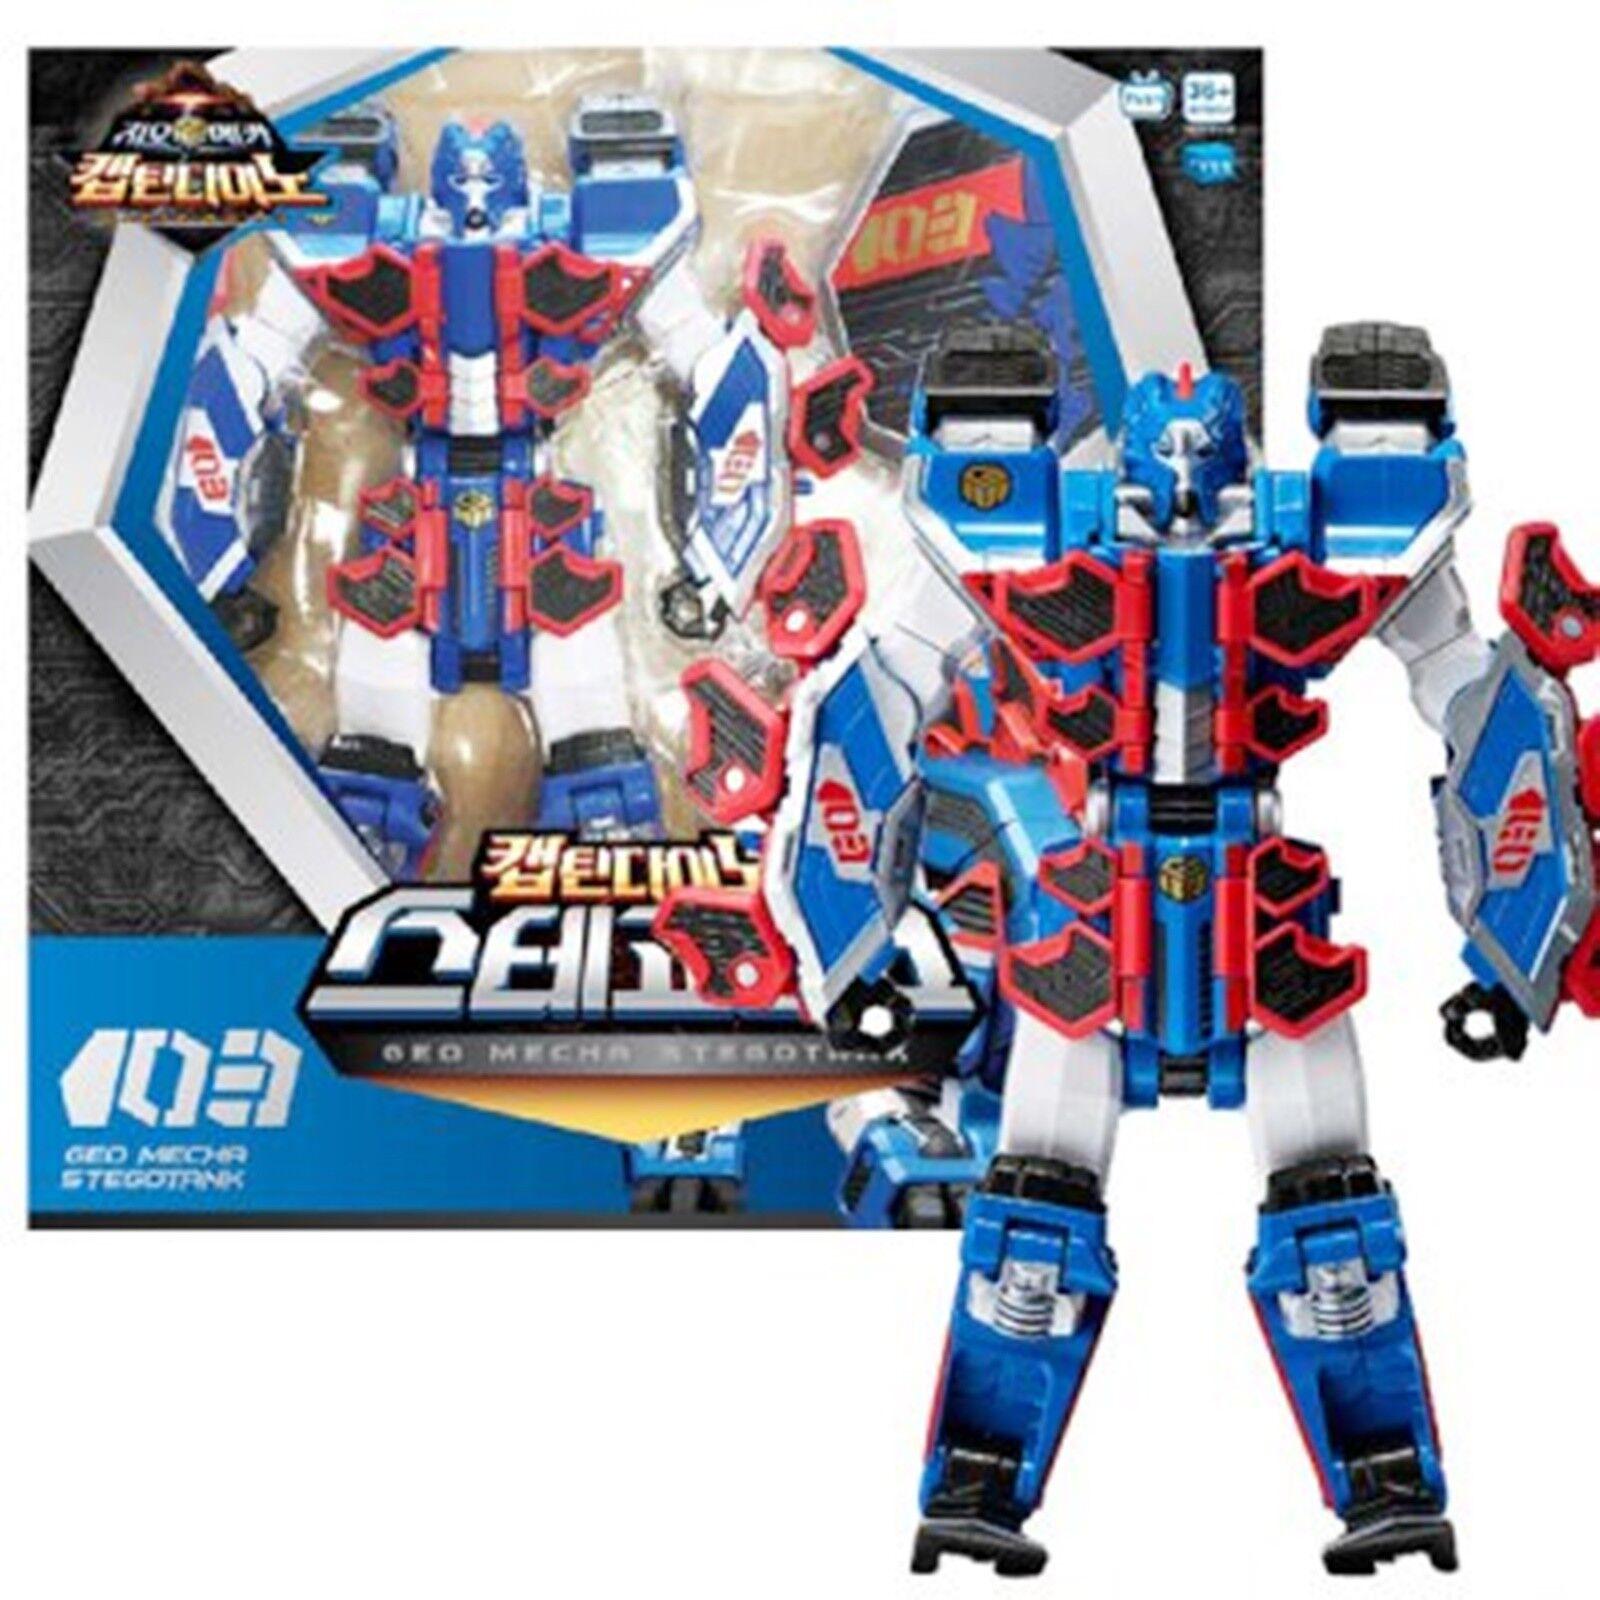 Geo Mecha captaindino stegotank transformateur Robot Action Figure Toy